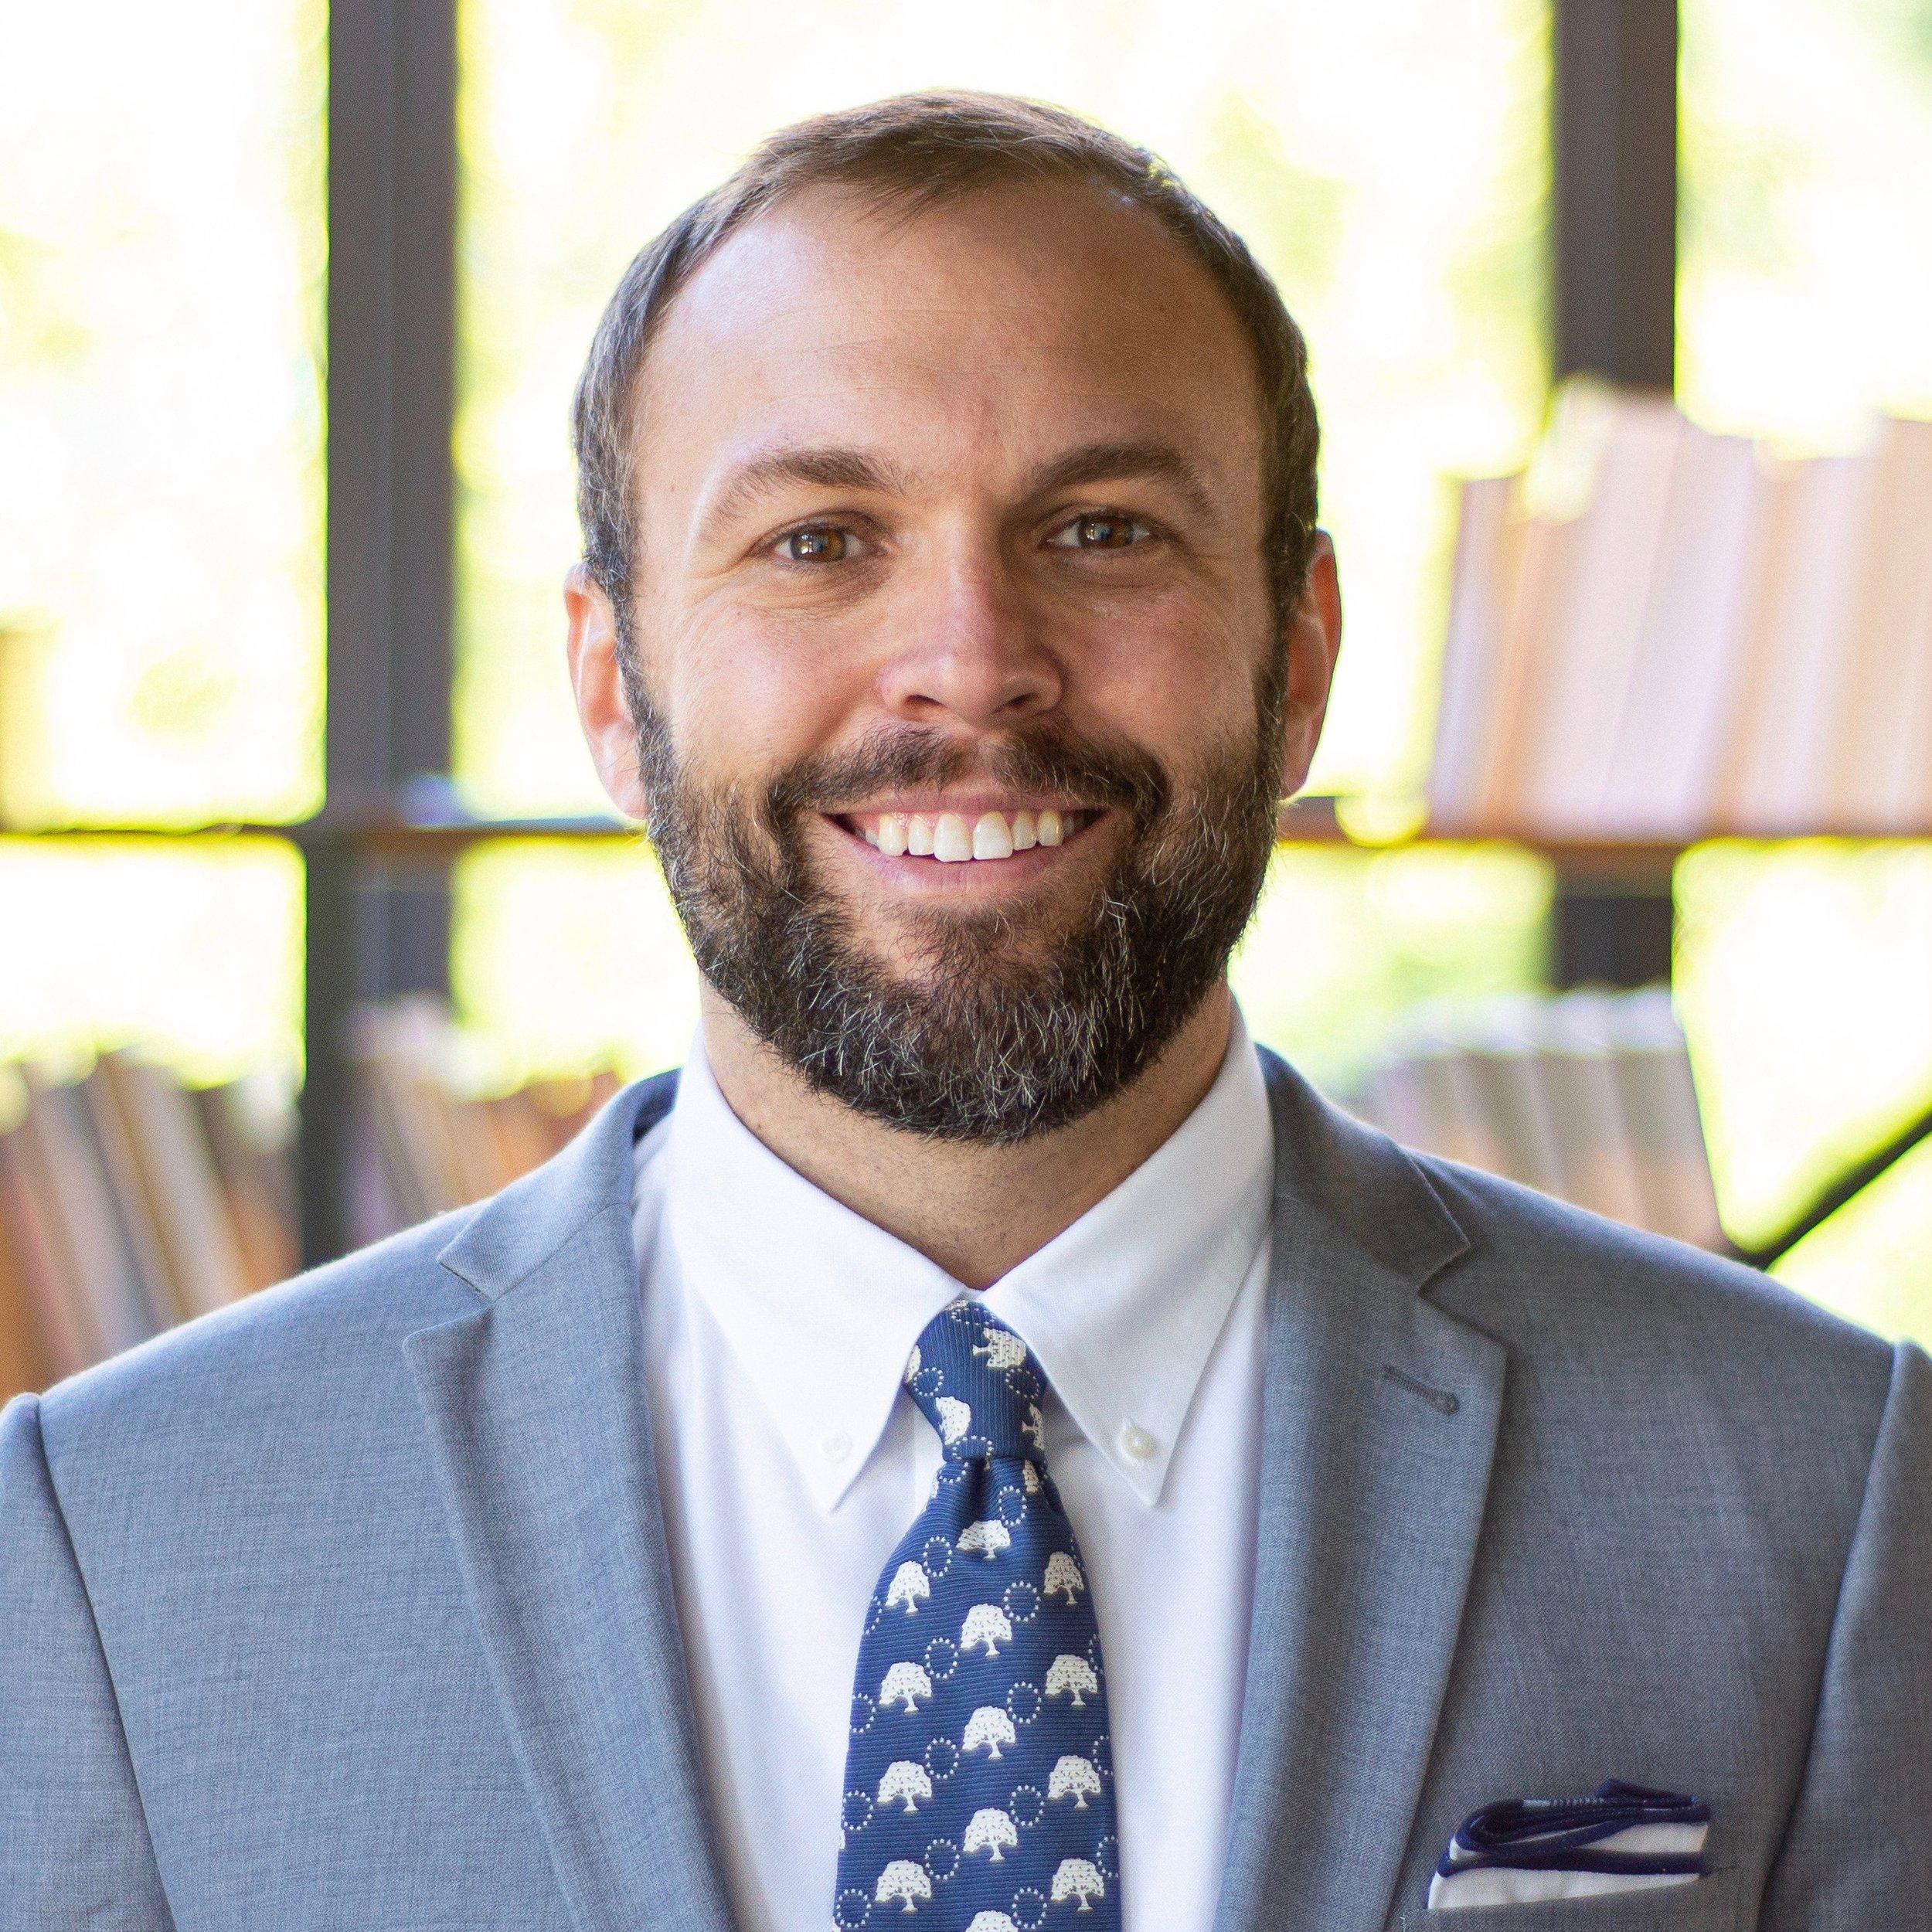 Jason Dees - Senior Pastorjason@christcovenant.com